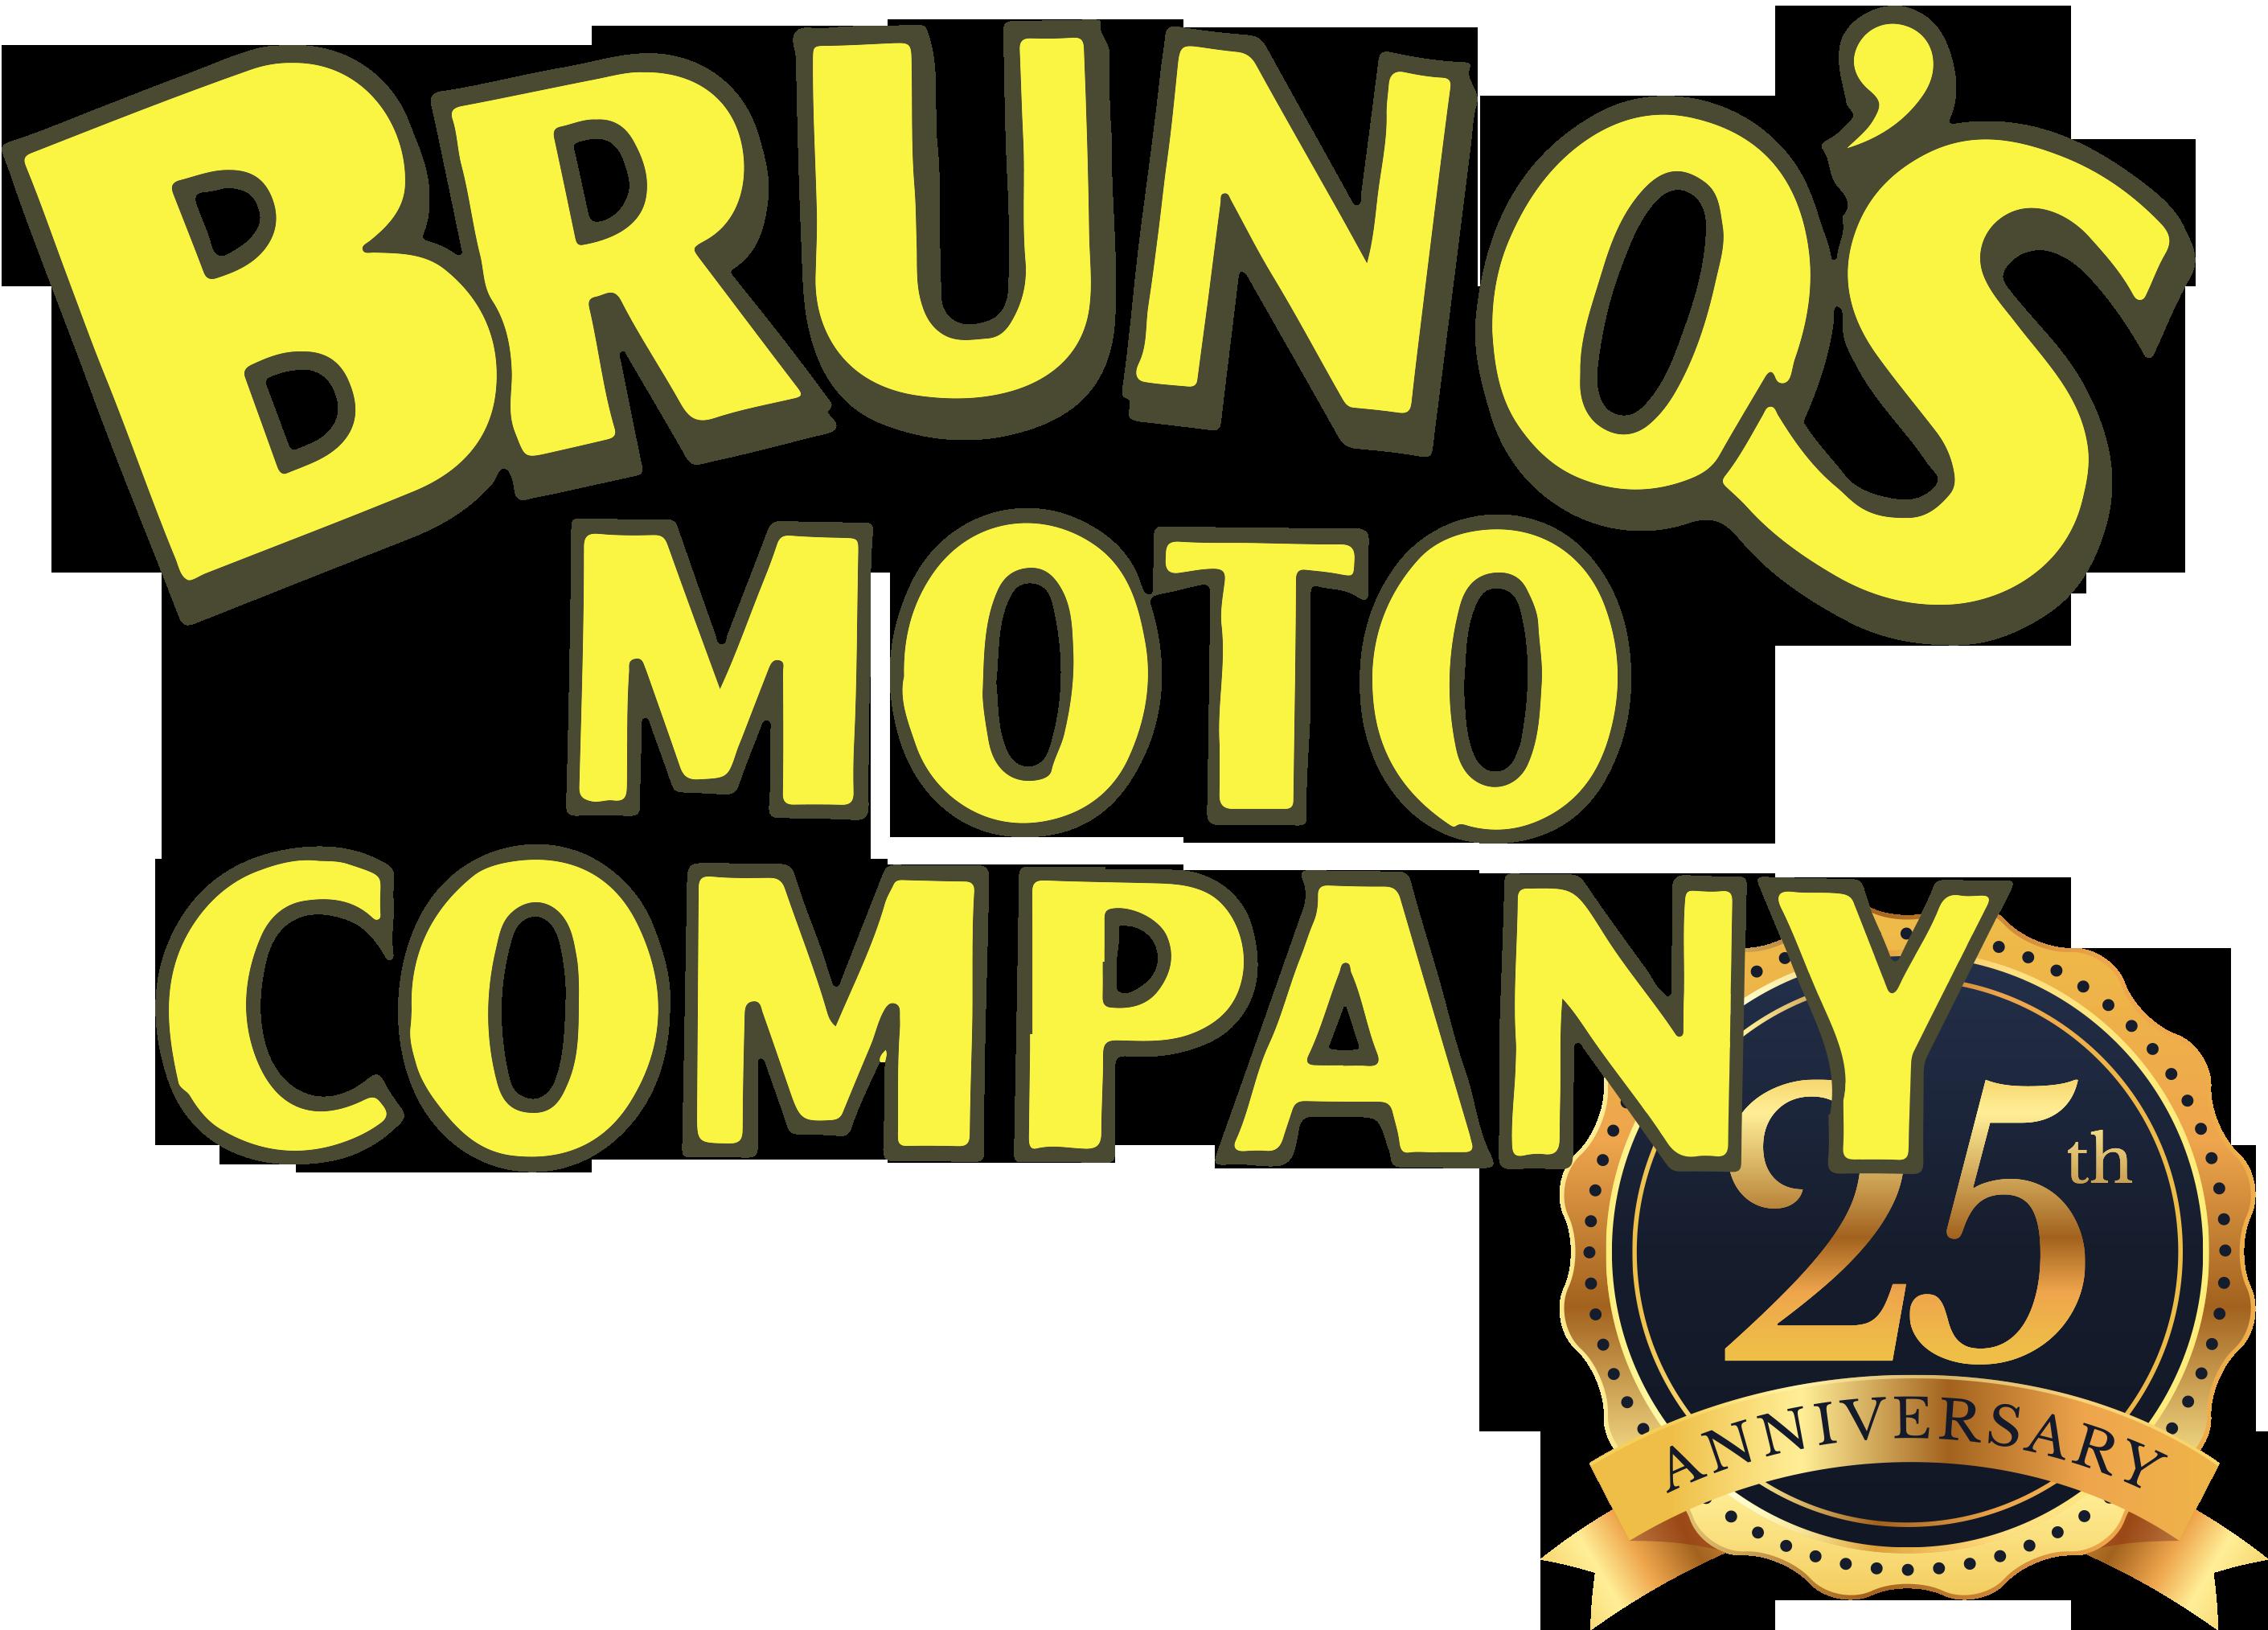 Logo Bruno's Moto Company 25 Jahre